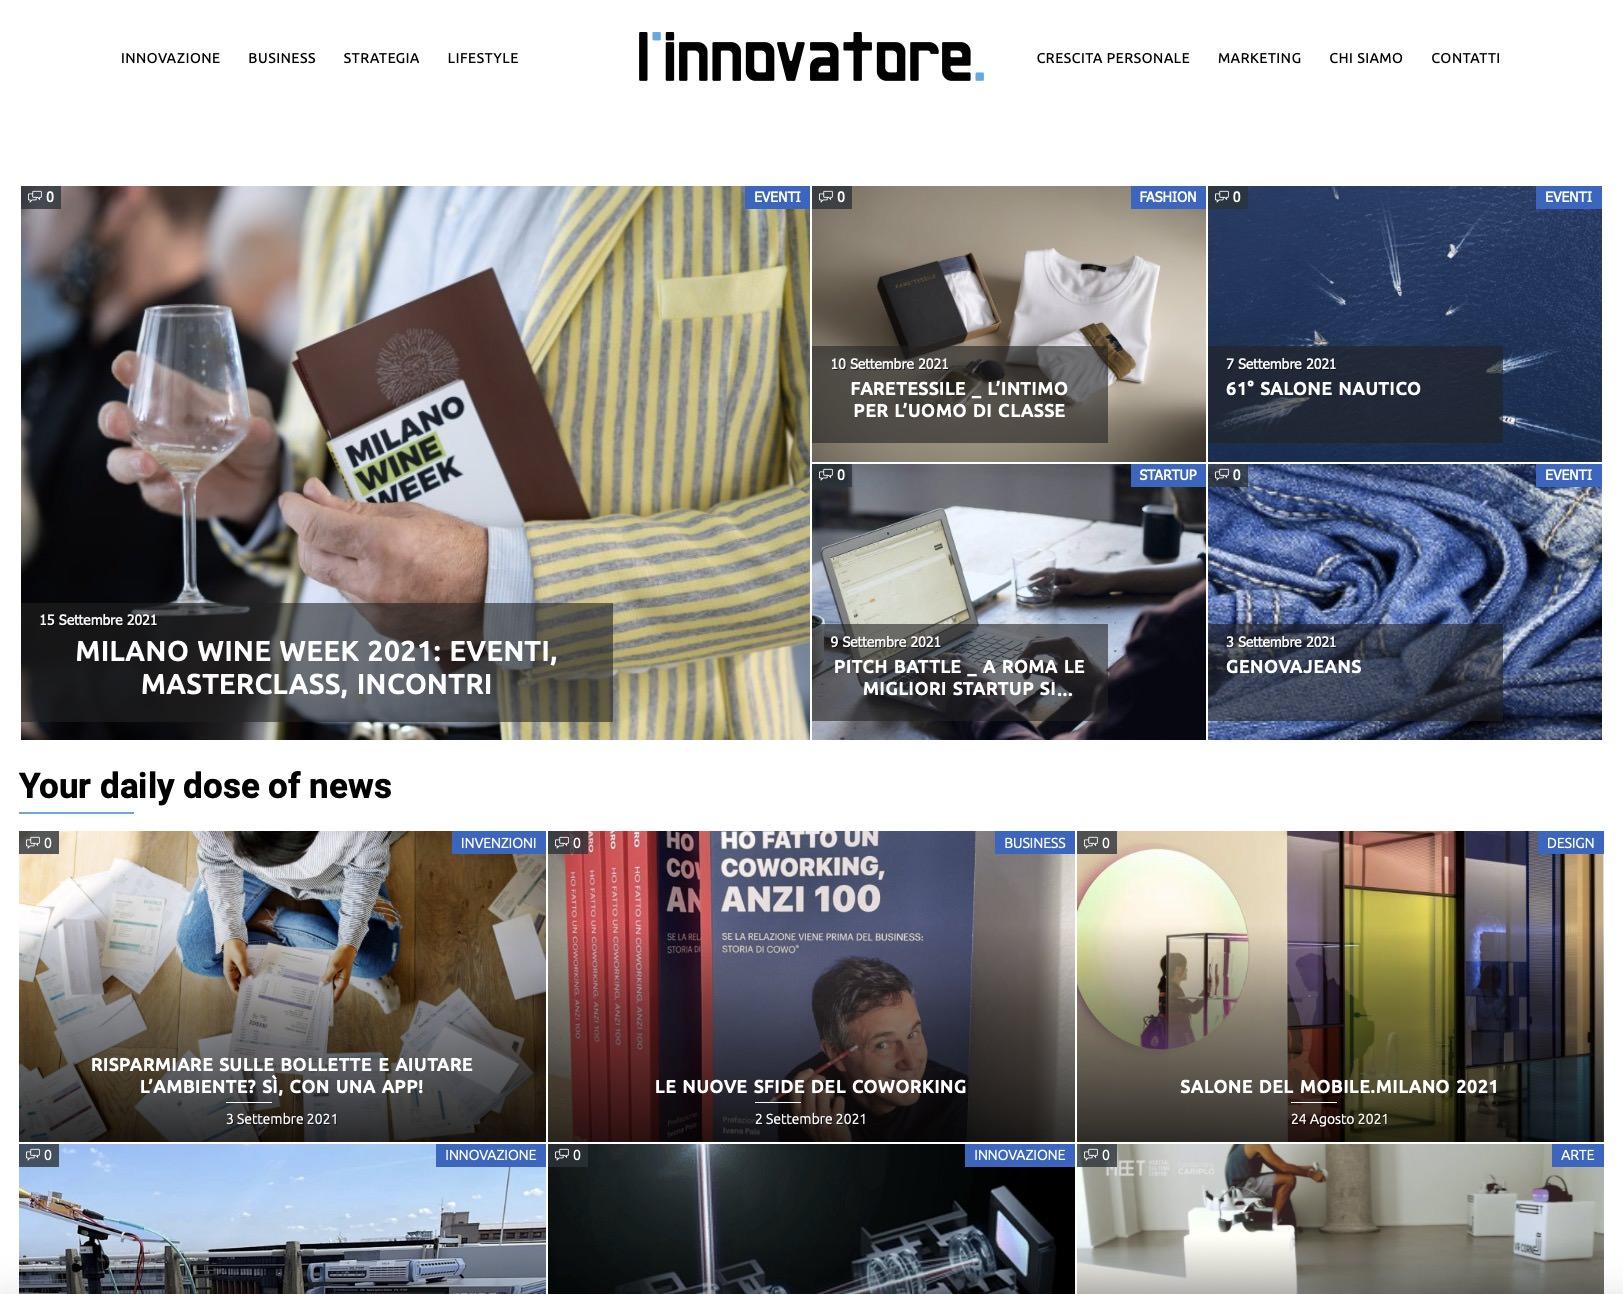 L'innovatore 1